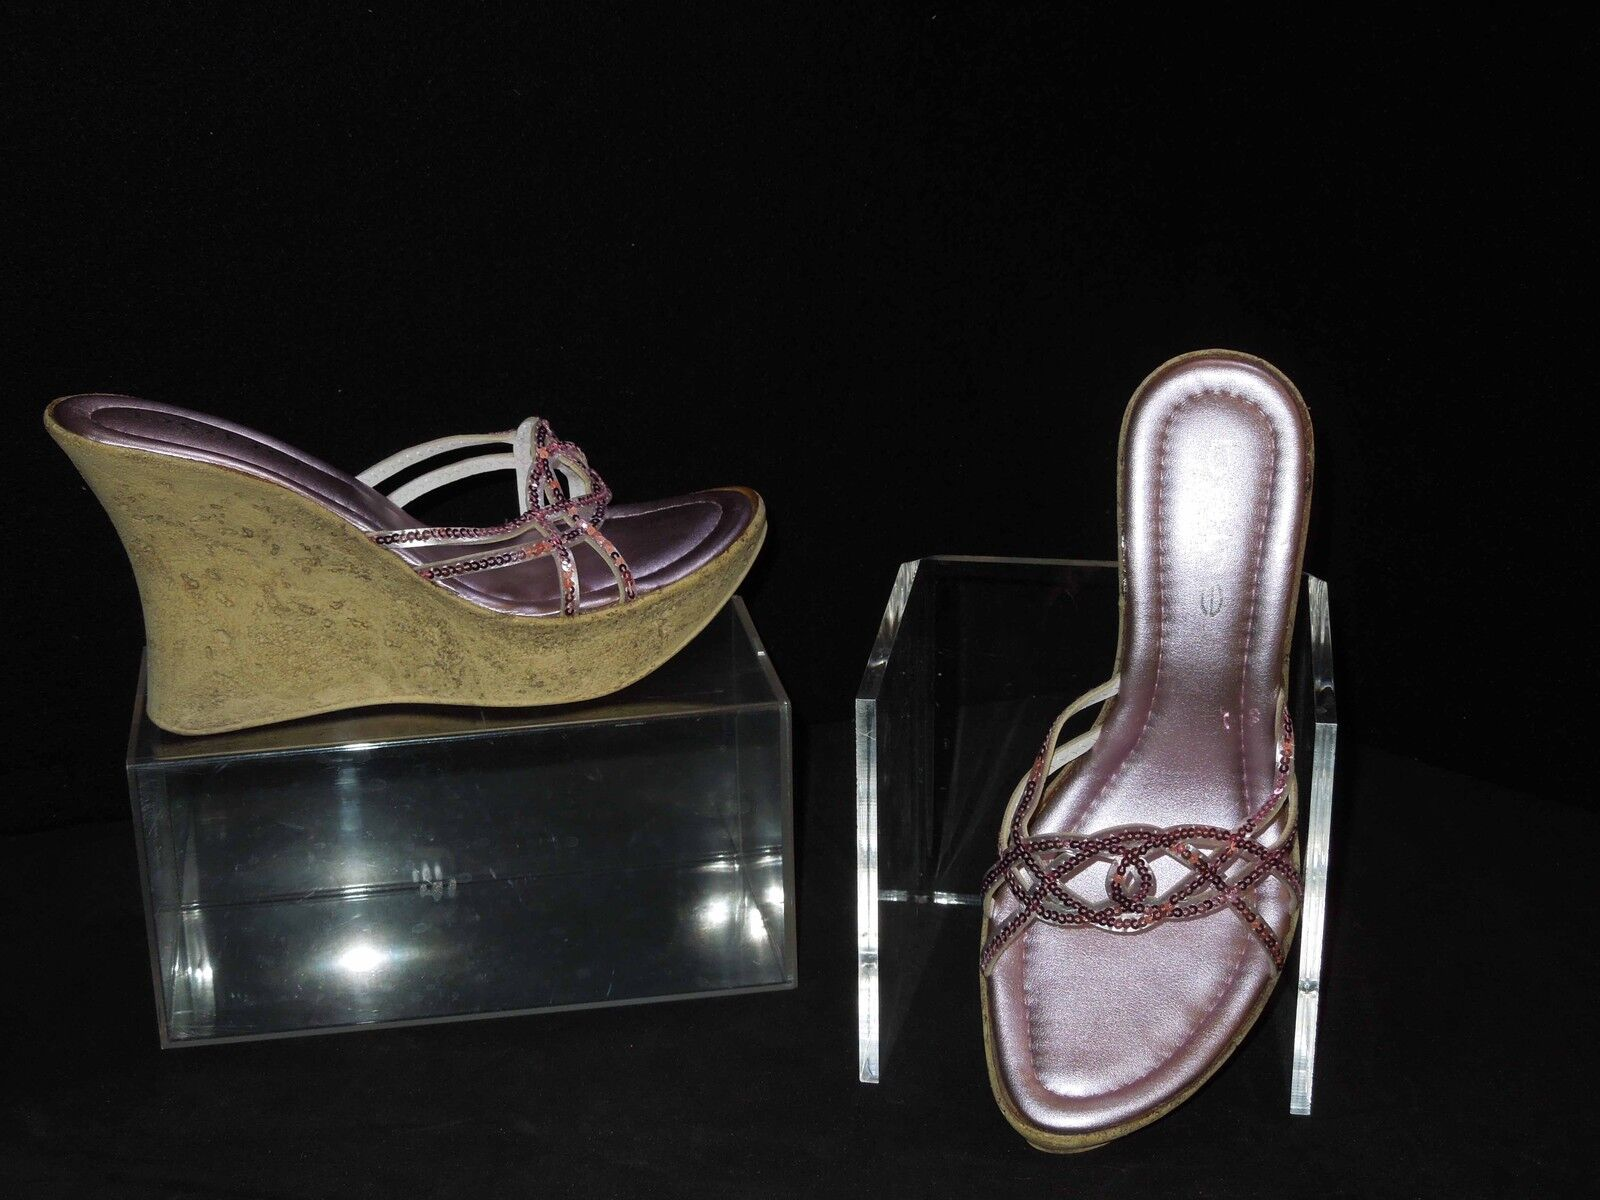 Bebe púrpura rosadododo Lentejuelas    cariño  sandalia de cuña 7M dc3253